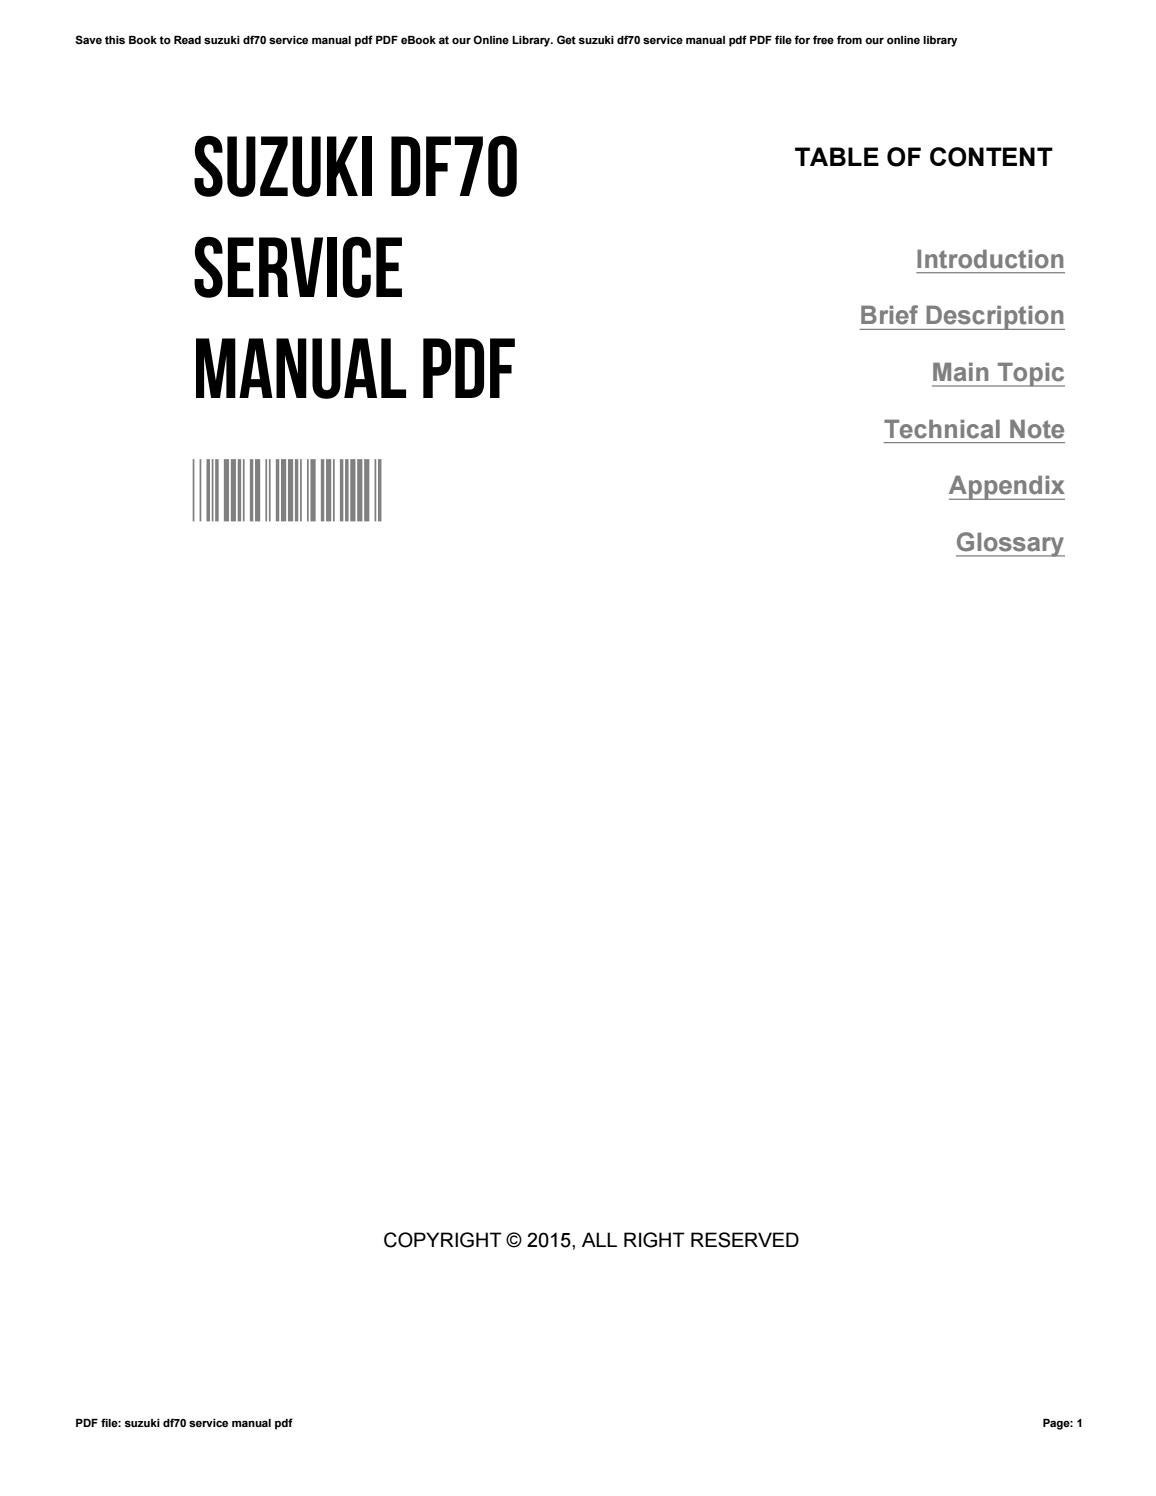 ... Array - suzuki df70 service manual pdf by katrinasands3037 issuu rh  issuu ...